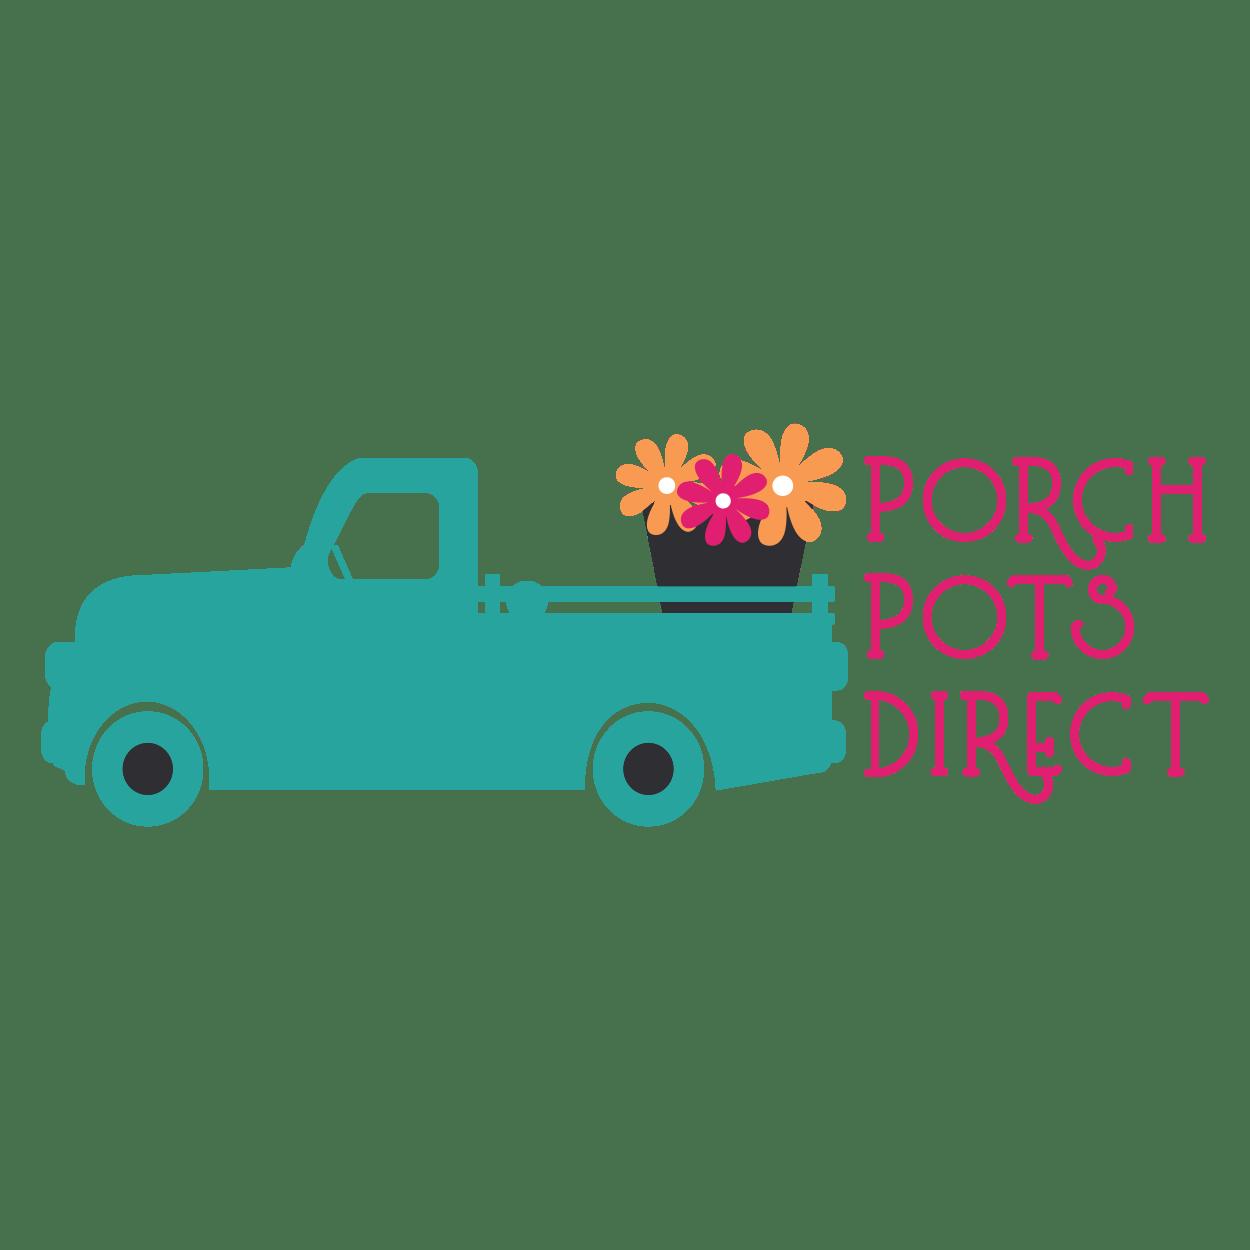 Porch Pots Direct Logo - Indiana - Designed by CraftnDraft Inc